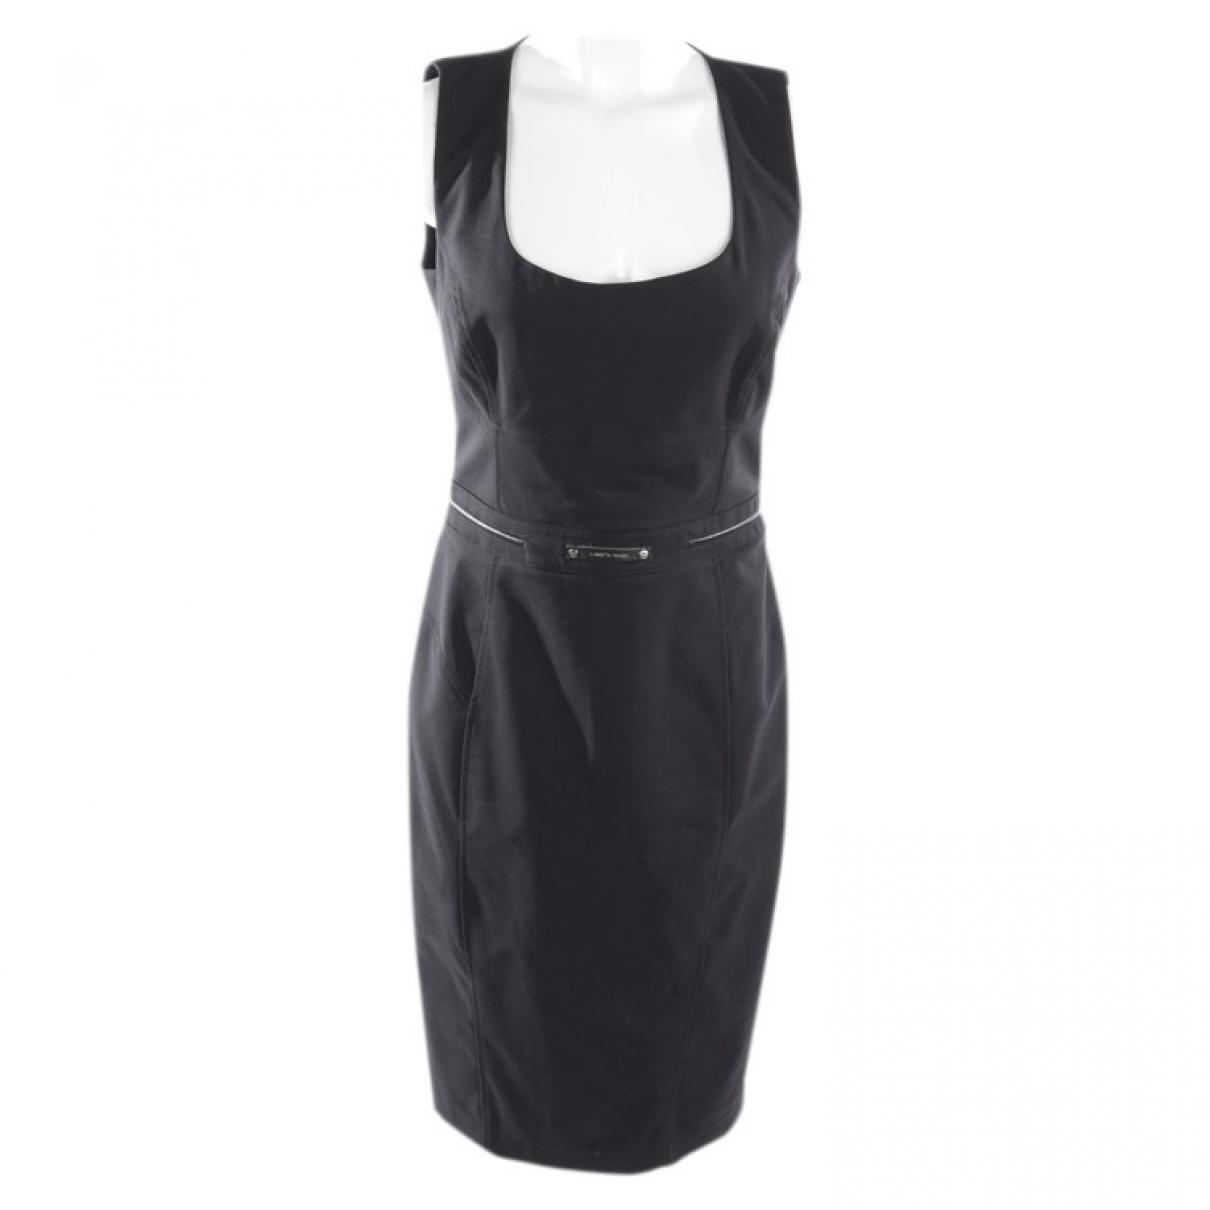 Elisabetta Franchi \N Black Cotton dress for Women 40 FR